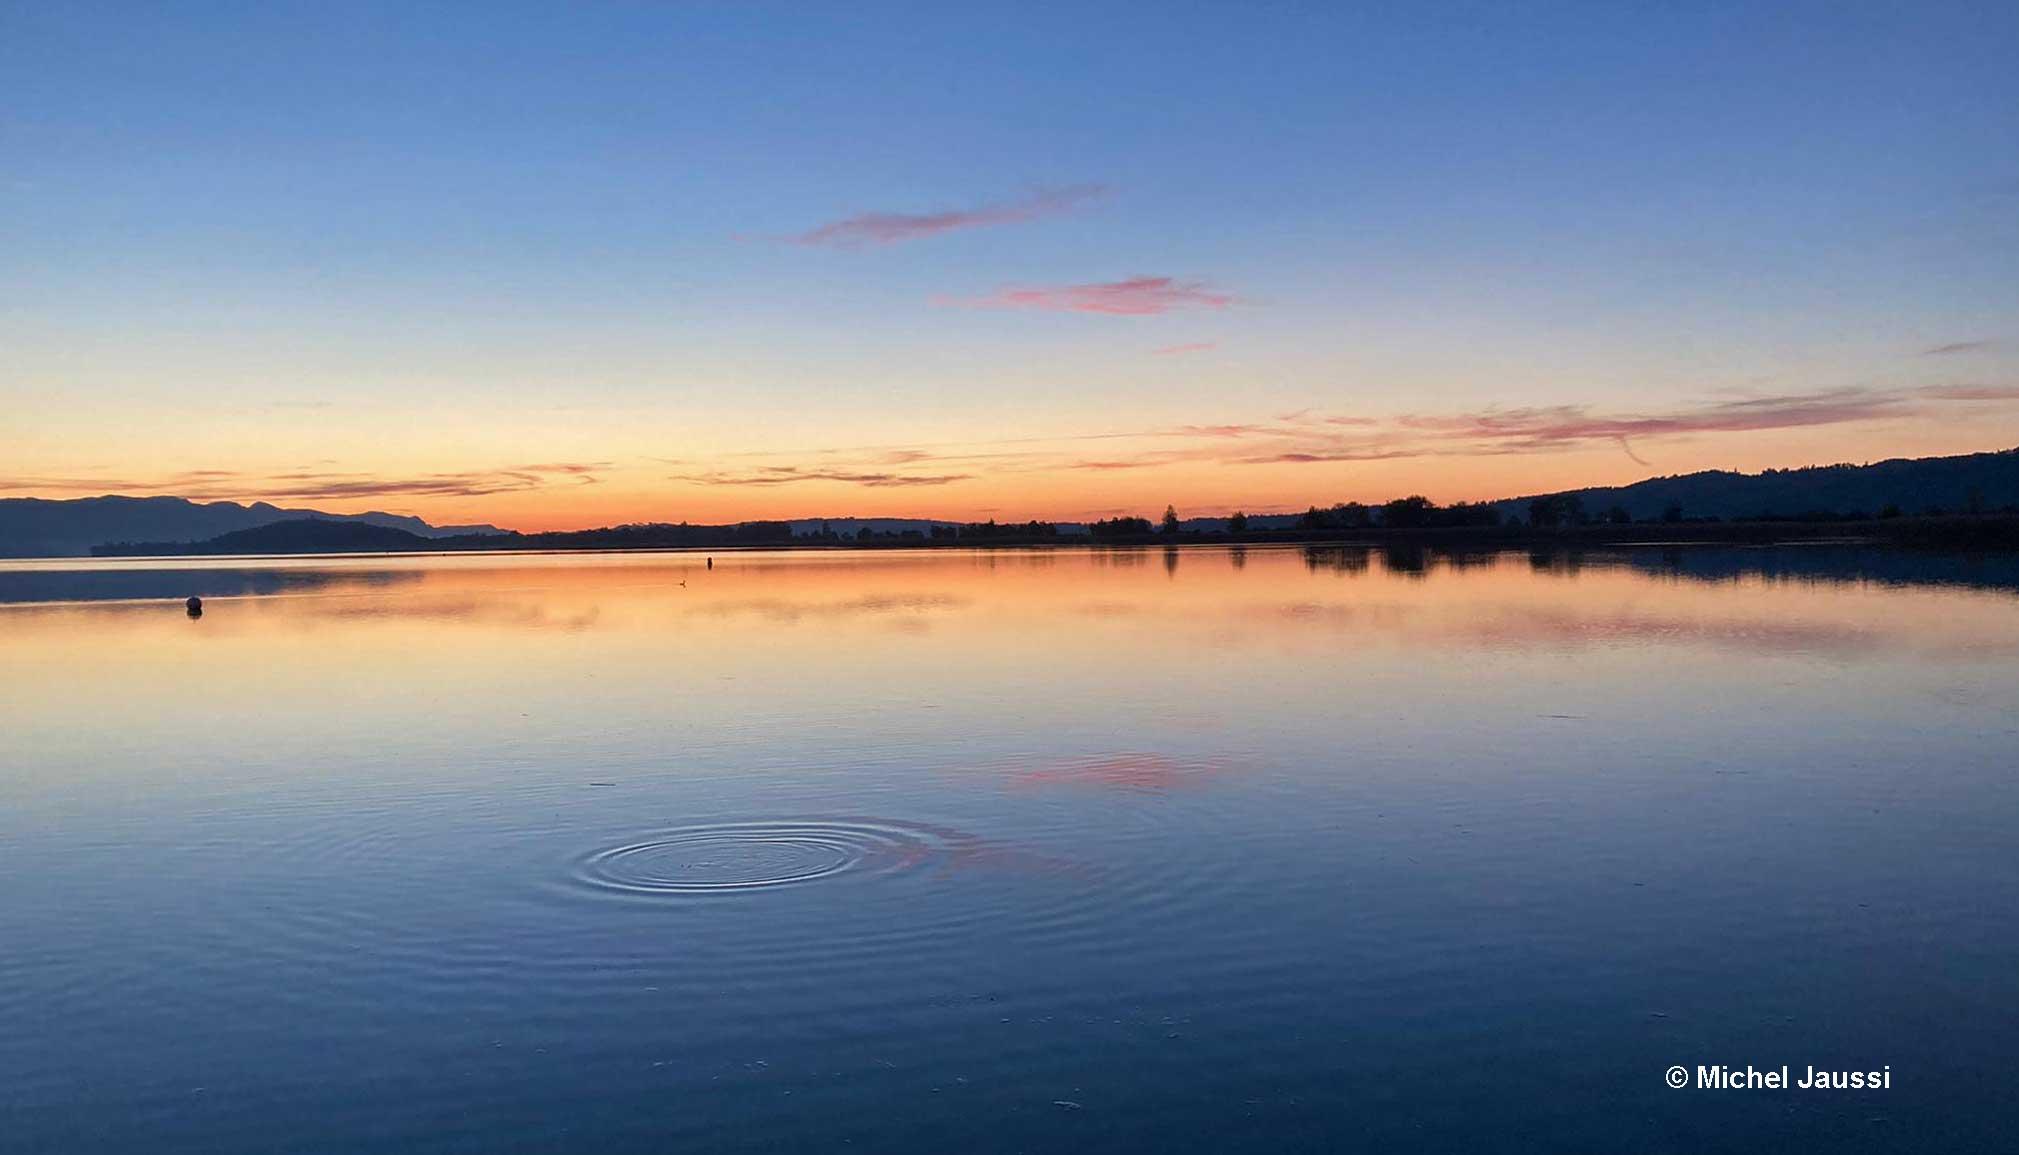 Dawn over Lake of Bienne